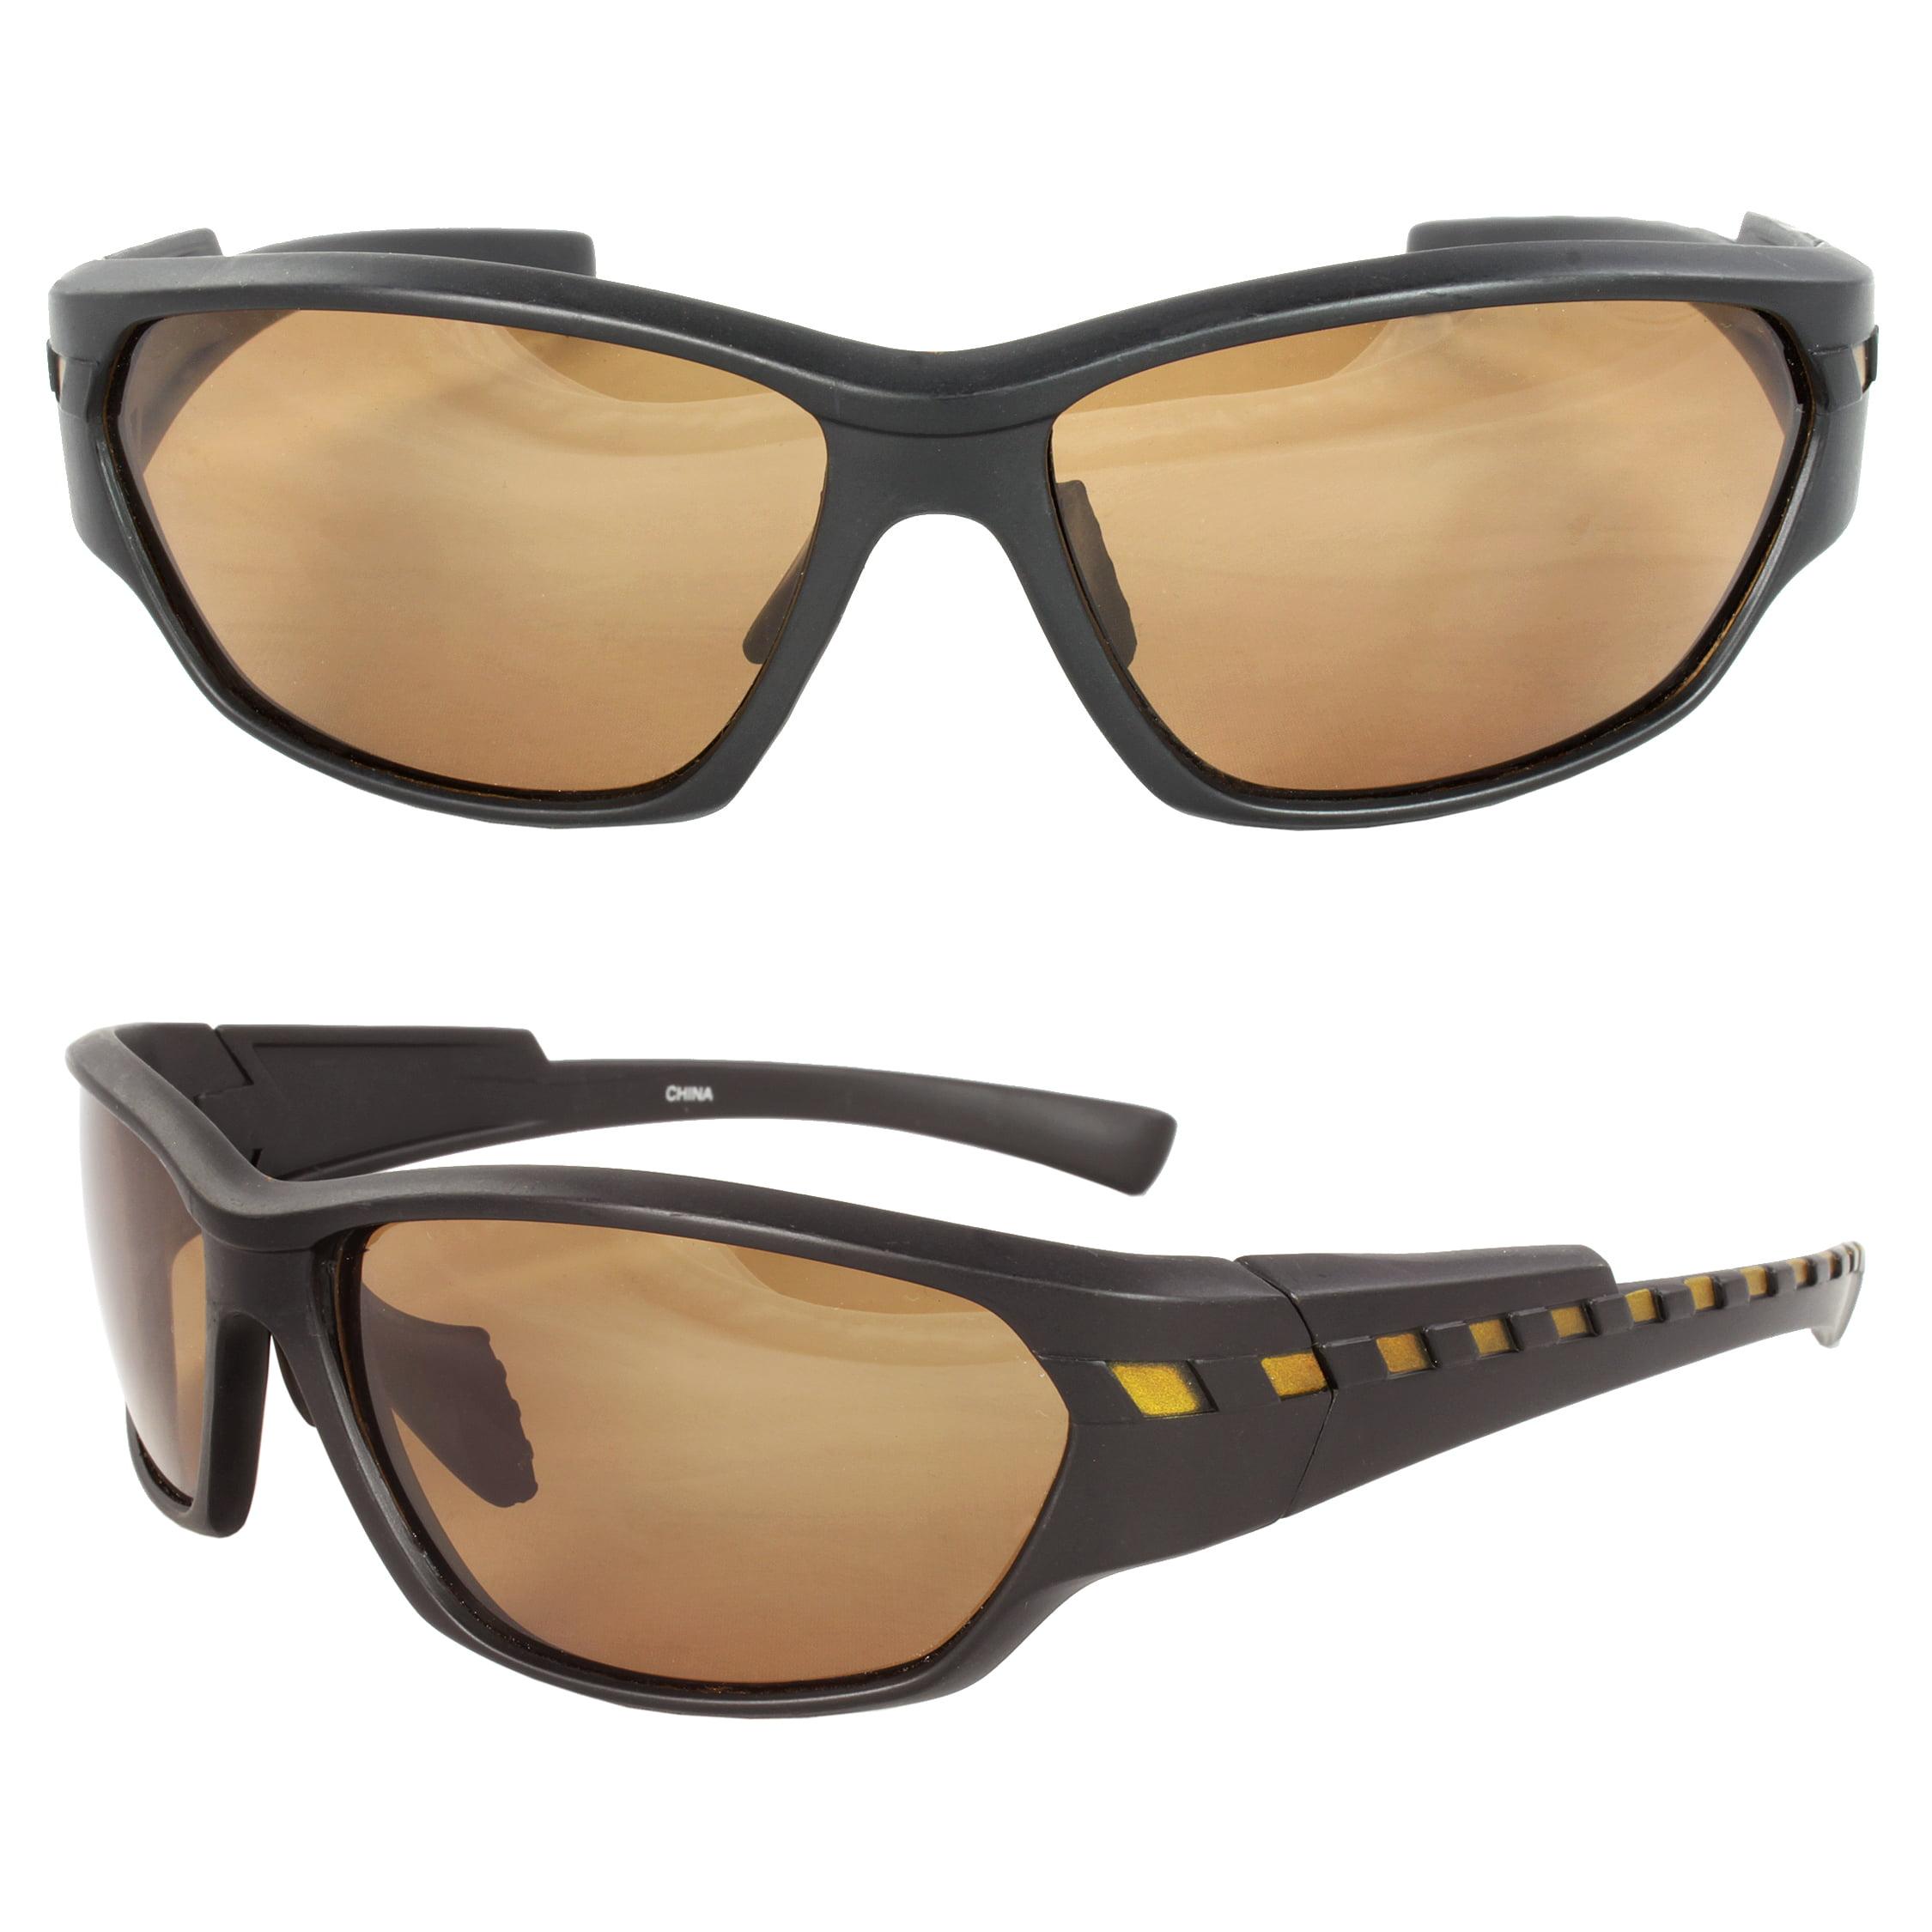 Polarized Wrap Around Fashion Sunglasses Black Brown Frame Black Lenses with Comfortable Rubber Cushion Pad